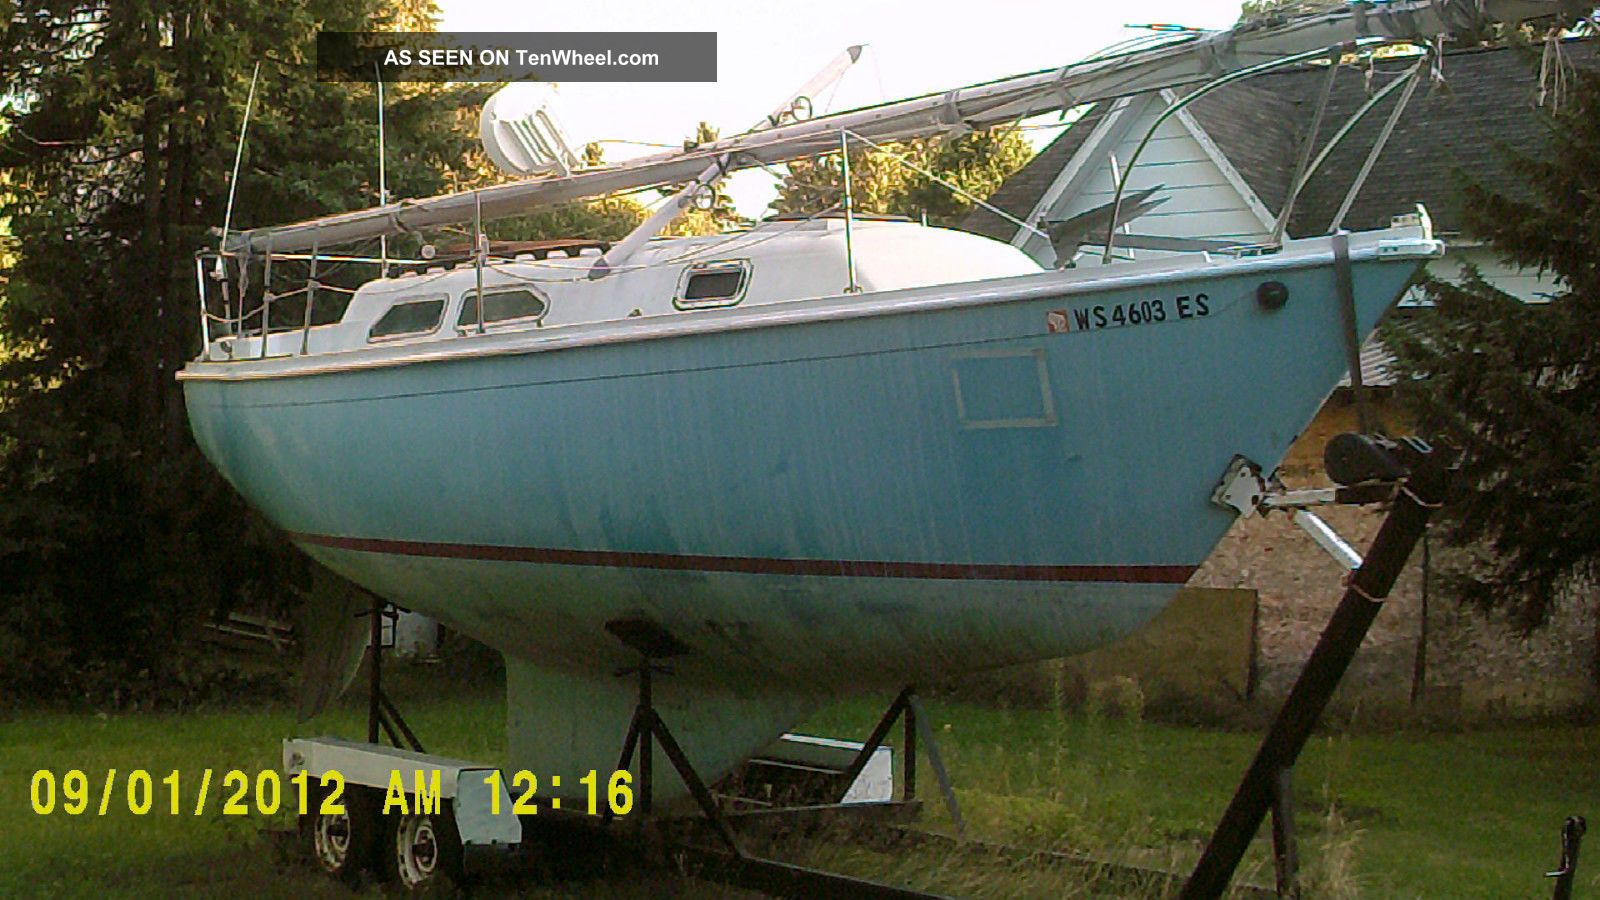 1973 Ericson Yachts 27 Sailboats 20-27 feet photo